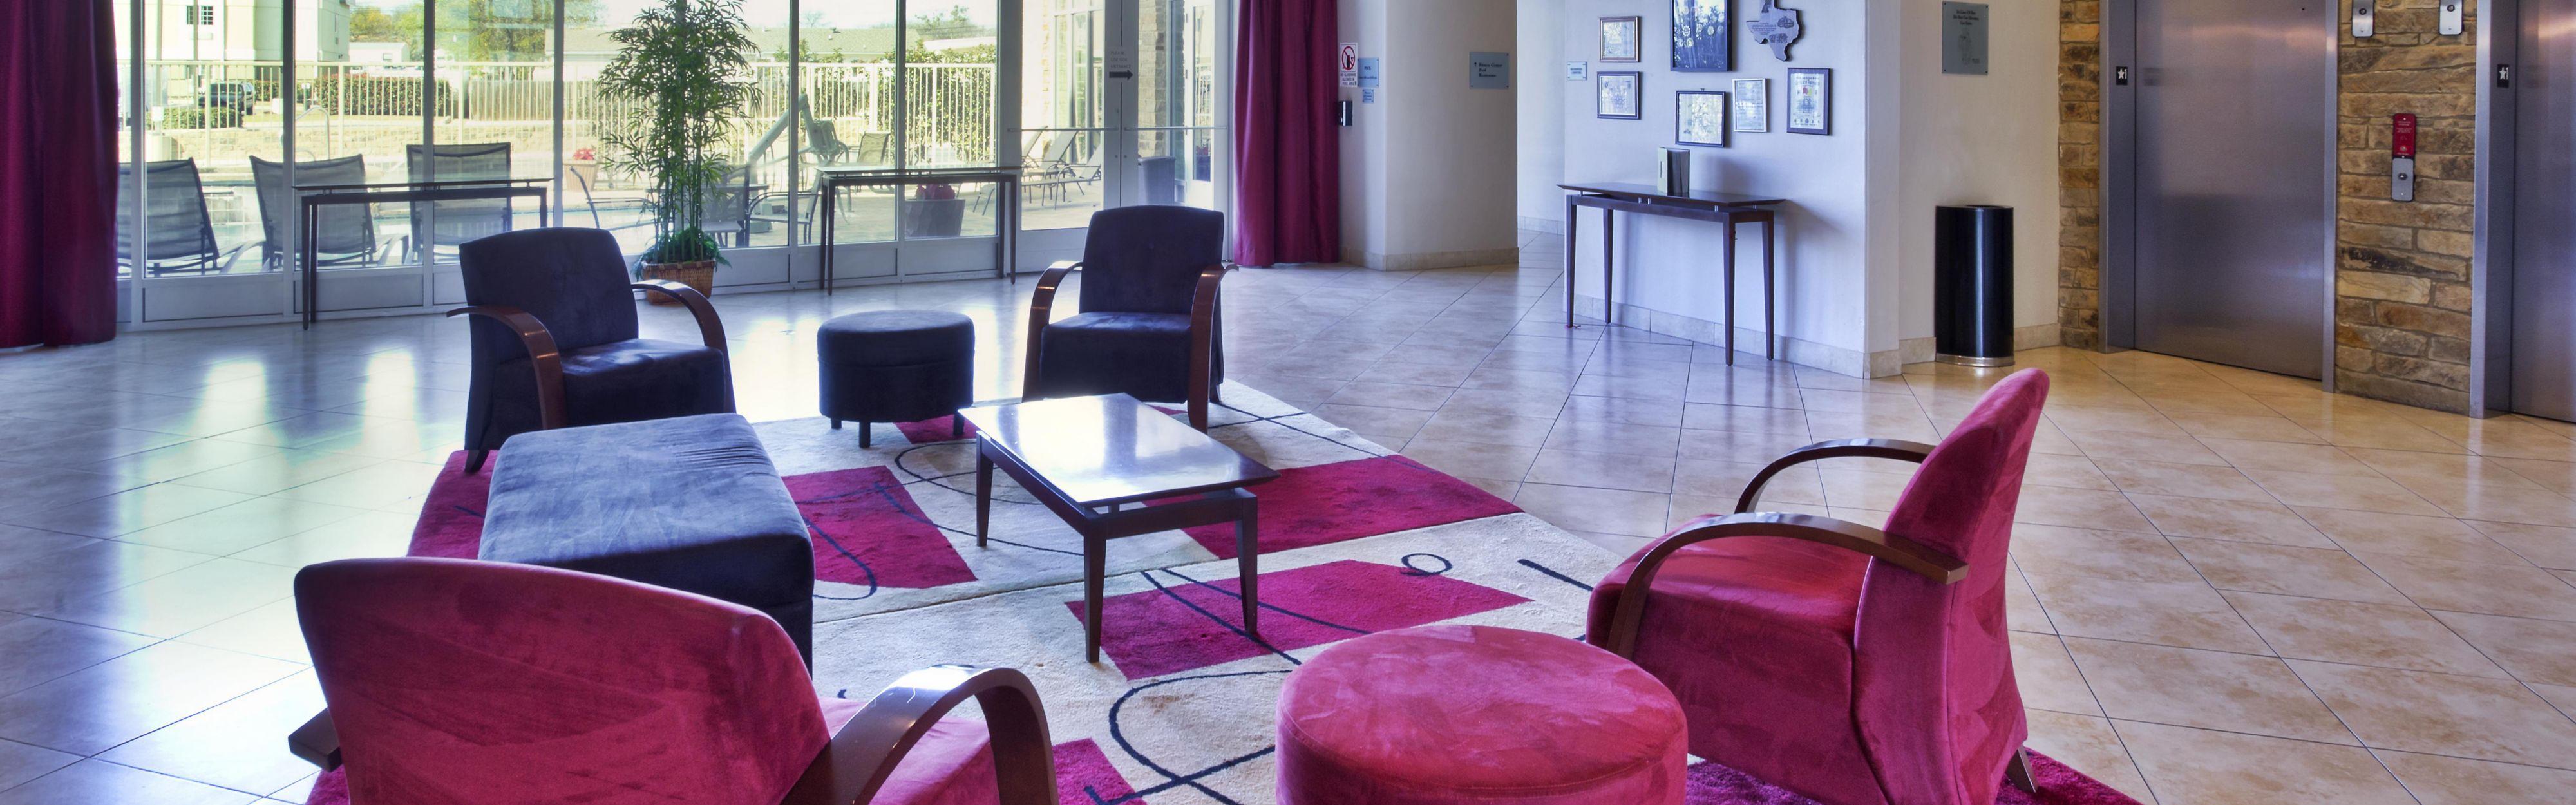 Entrance; Entrance; Hotel Lobby; Hotel Lobby ...